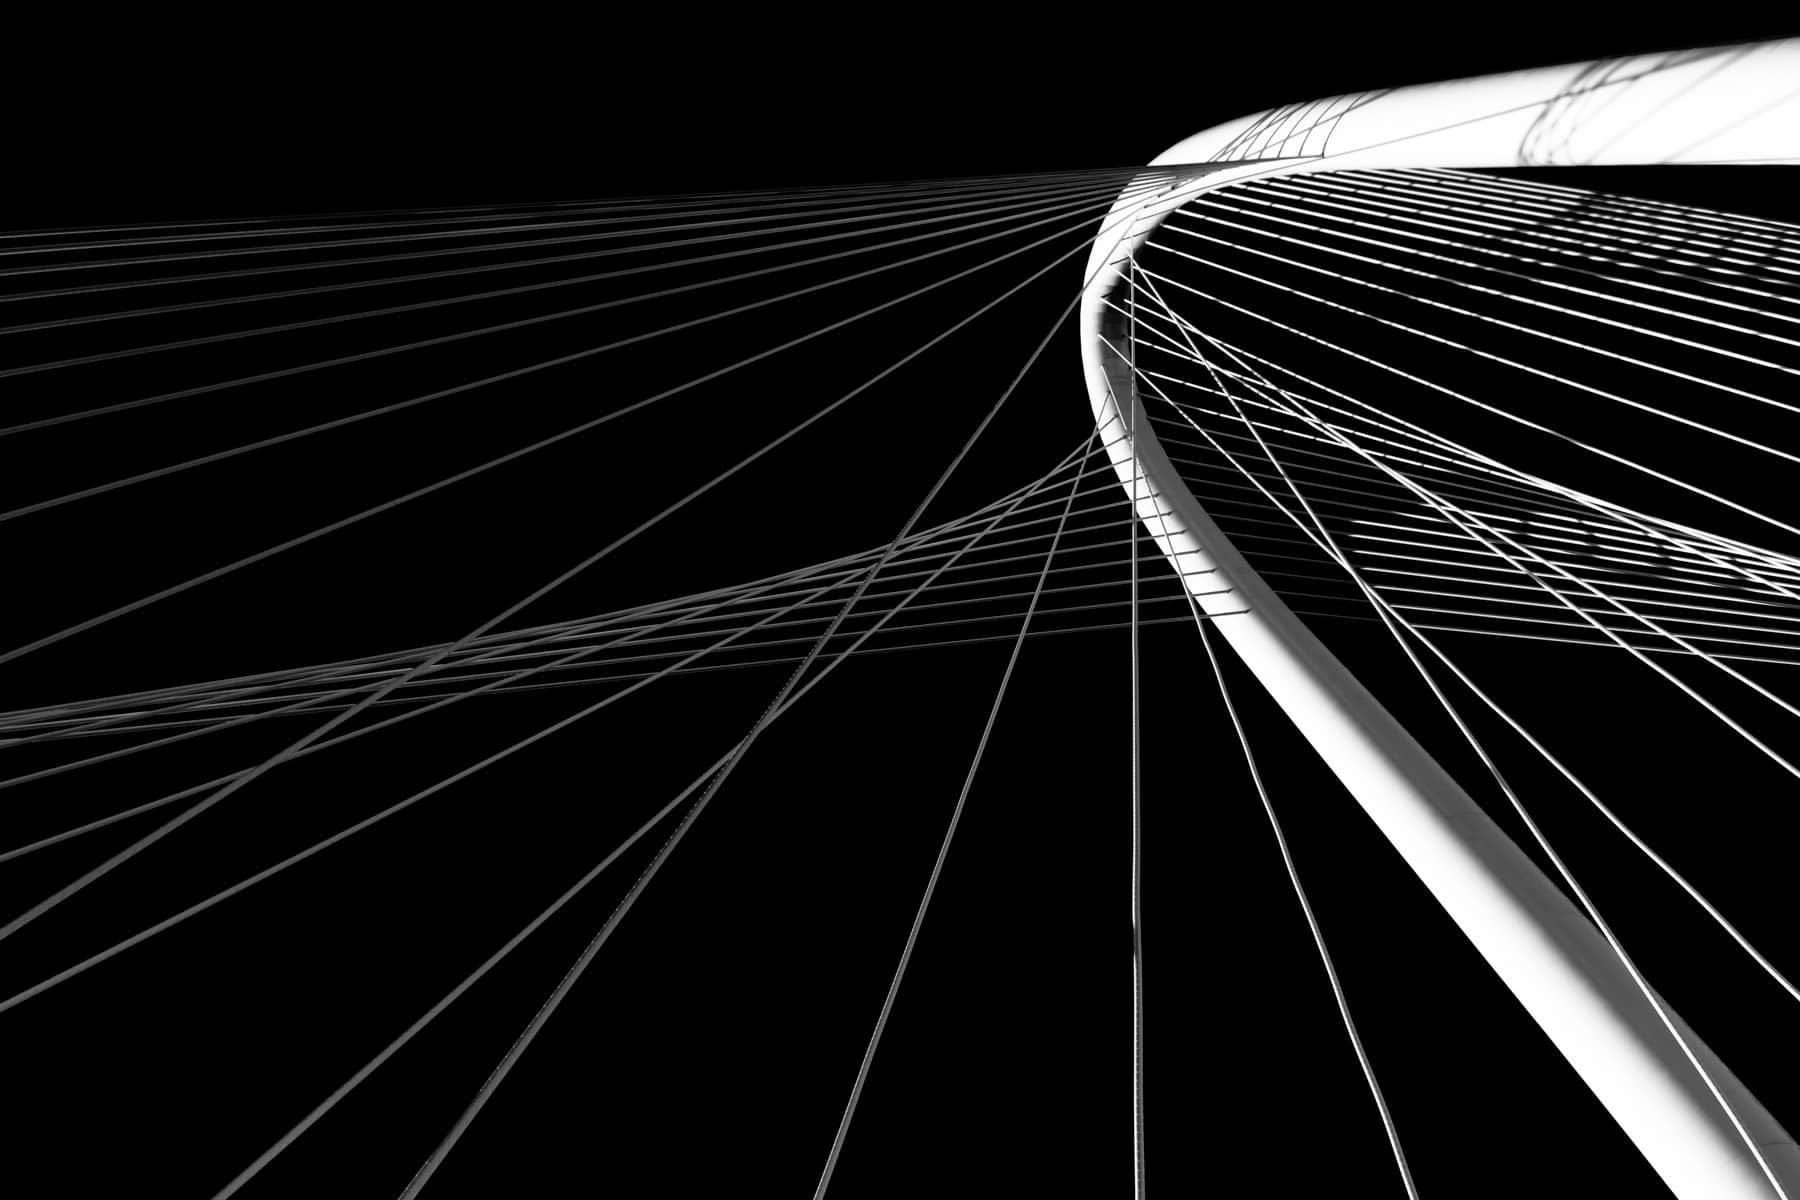 Support cables reach from the arch of the Santiago Calatrava-designed Margaret Hunt Hill Bridge over the Trinity River in Dallas.